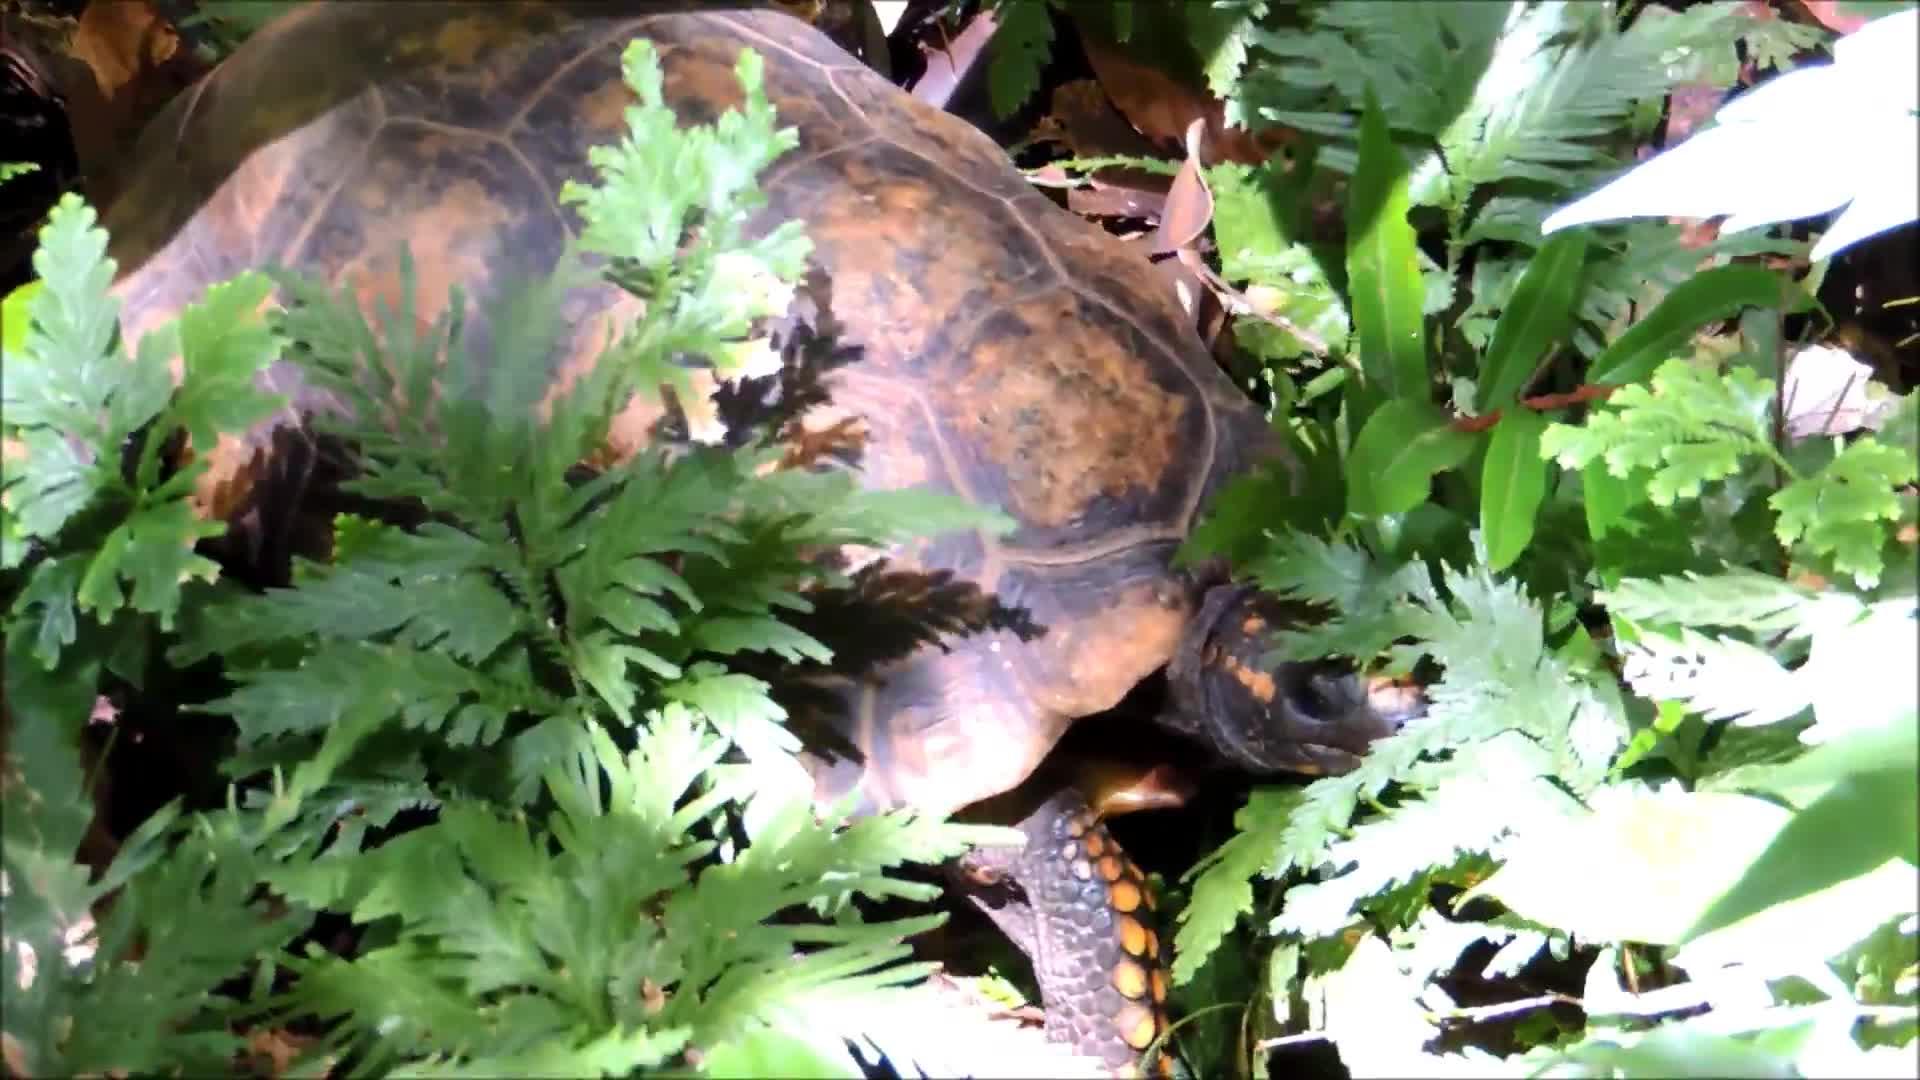 Chelonia, Chelonoidis denticulata, Guyana, Iwokrama, Rupununi, Surama, i love turtles, tortoise, turtle, yellow-footed tortoise, Male and Female Yellow-footed Tortoise in Rupununi, Guyana GIFs